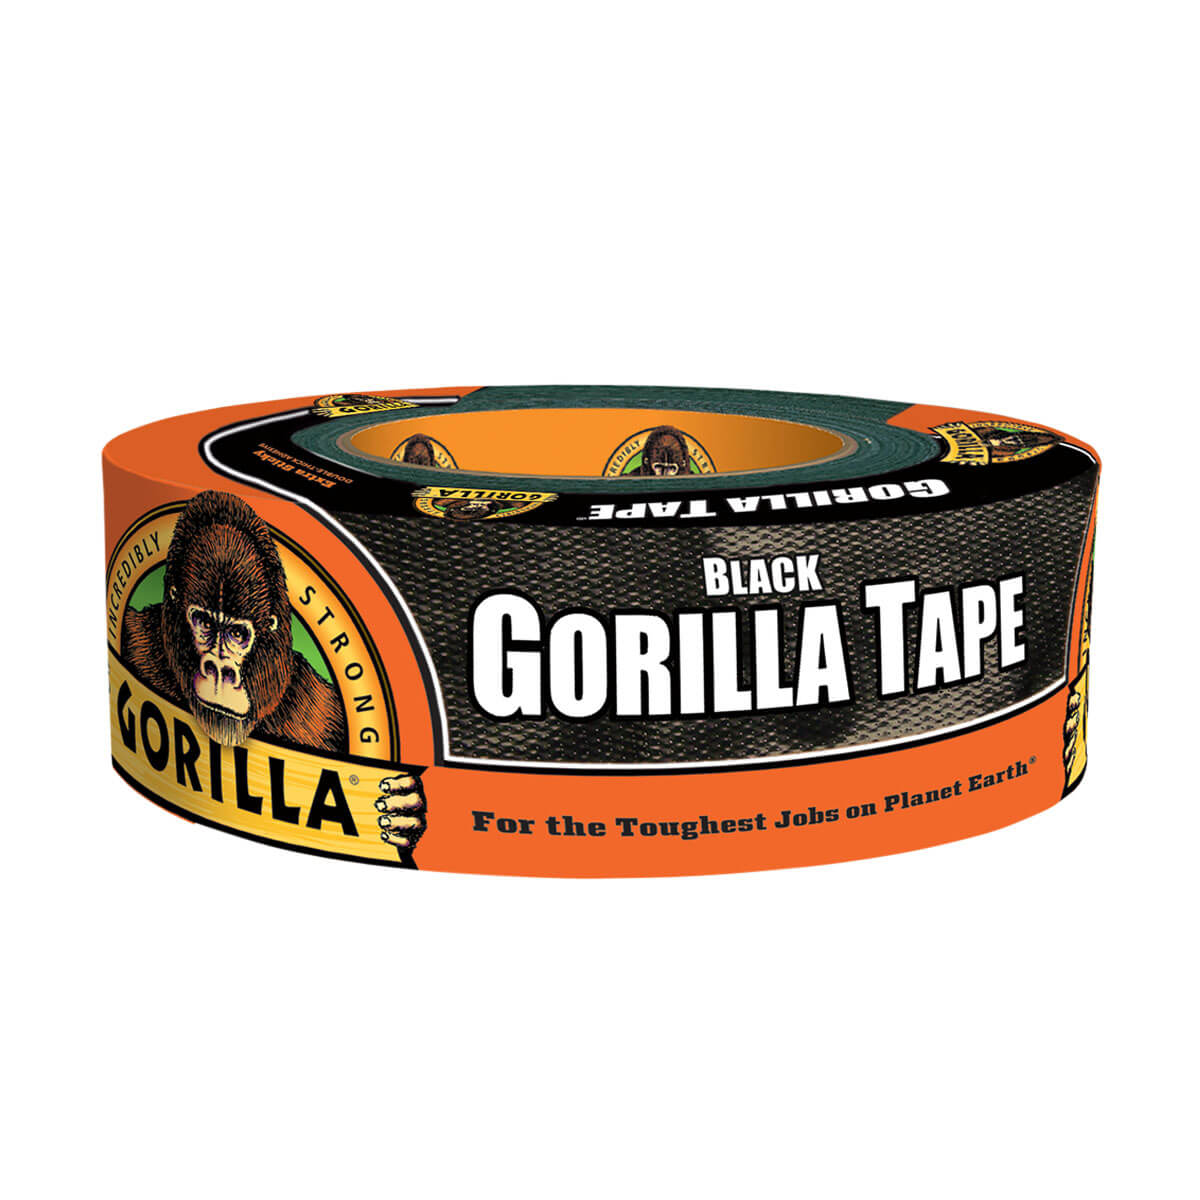 Black Gorilla Duct Tape - 1.88-in x 30 yd